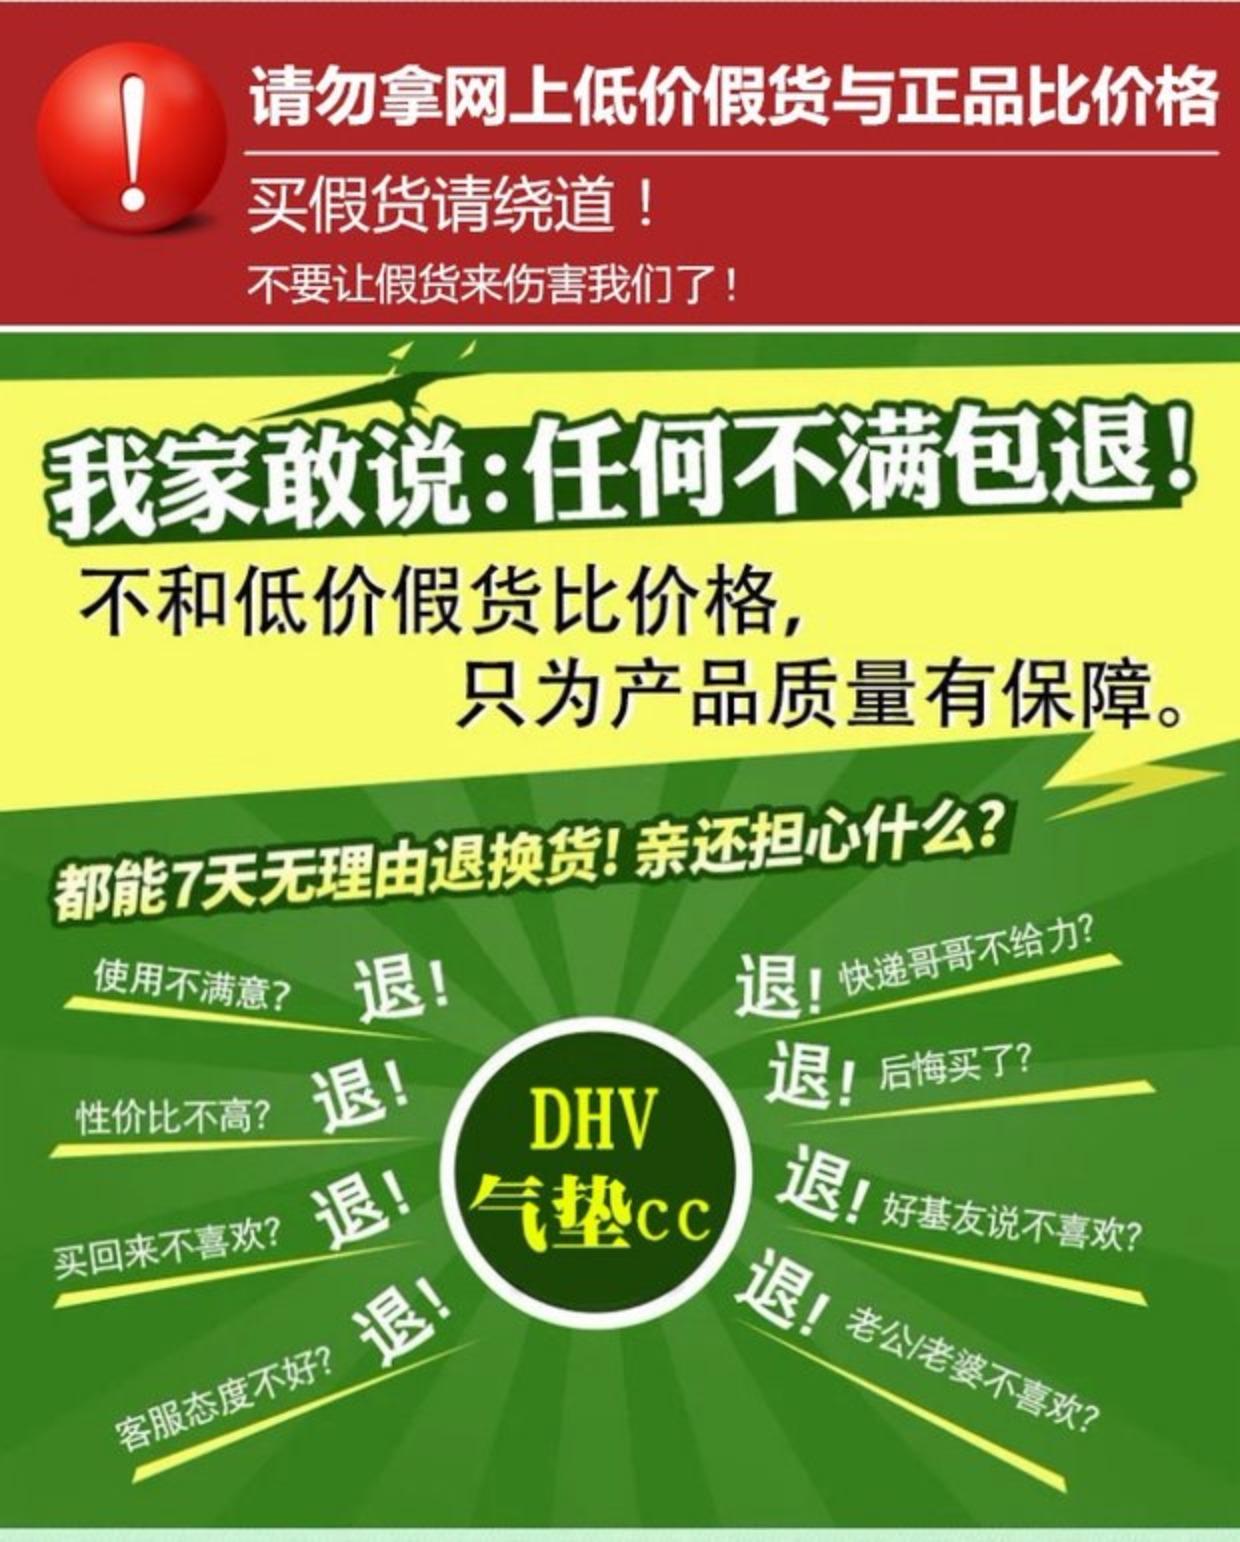 DHV致润无暇气垫cc霜正品提亮补水 抗污染修颜裸妆遮瑕bb霜隔离2张